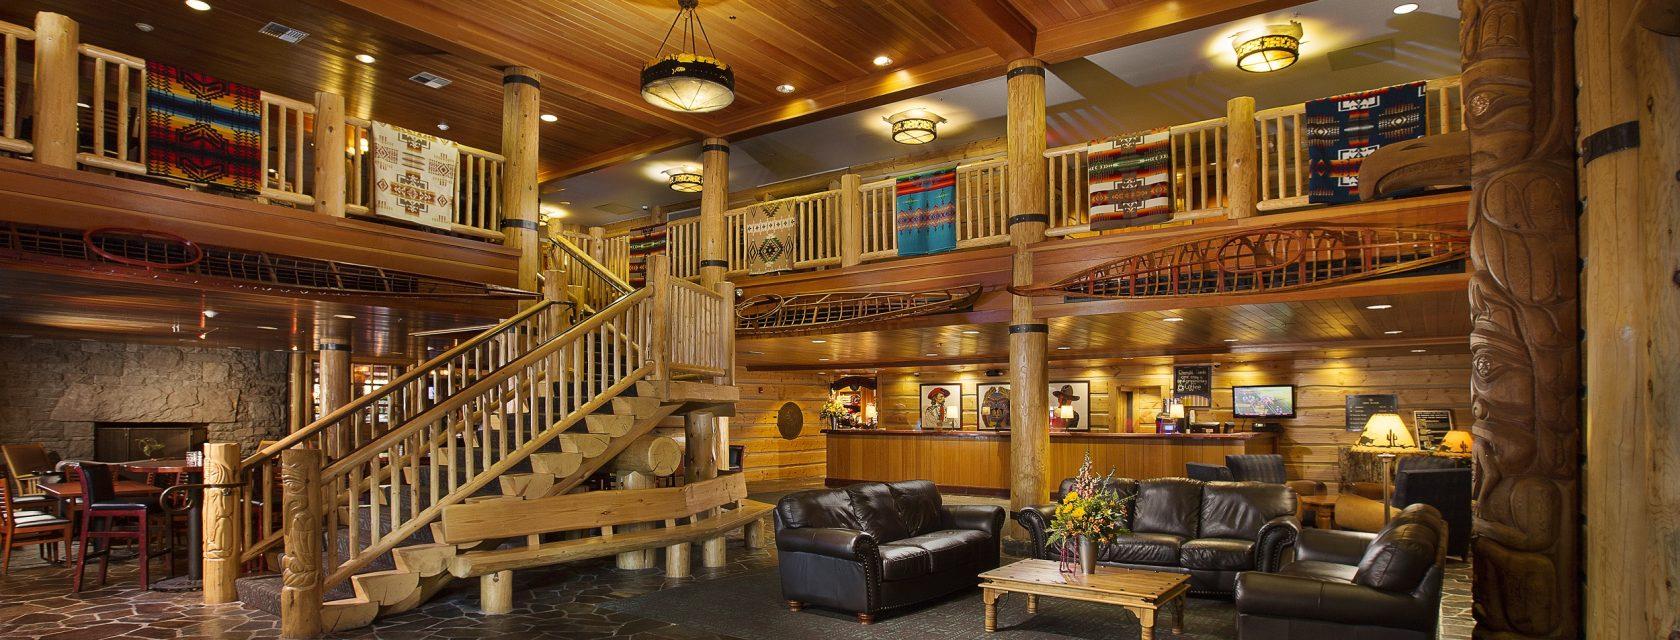 hotels in vancouver wa the heathman lodge